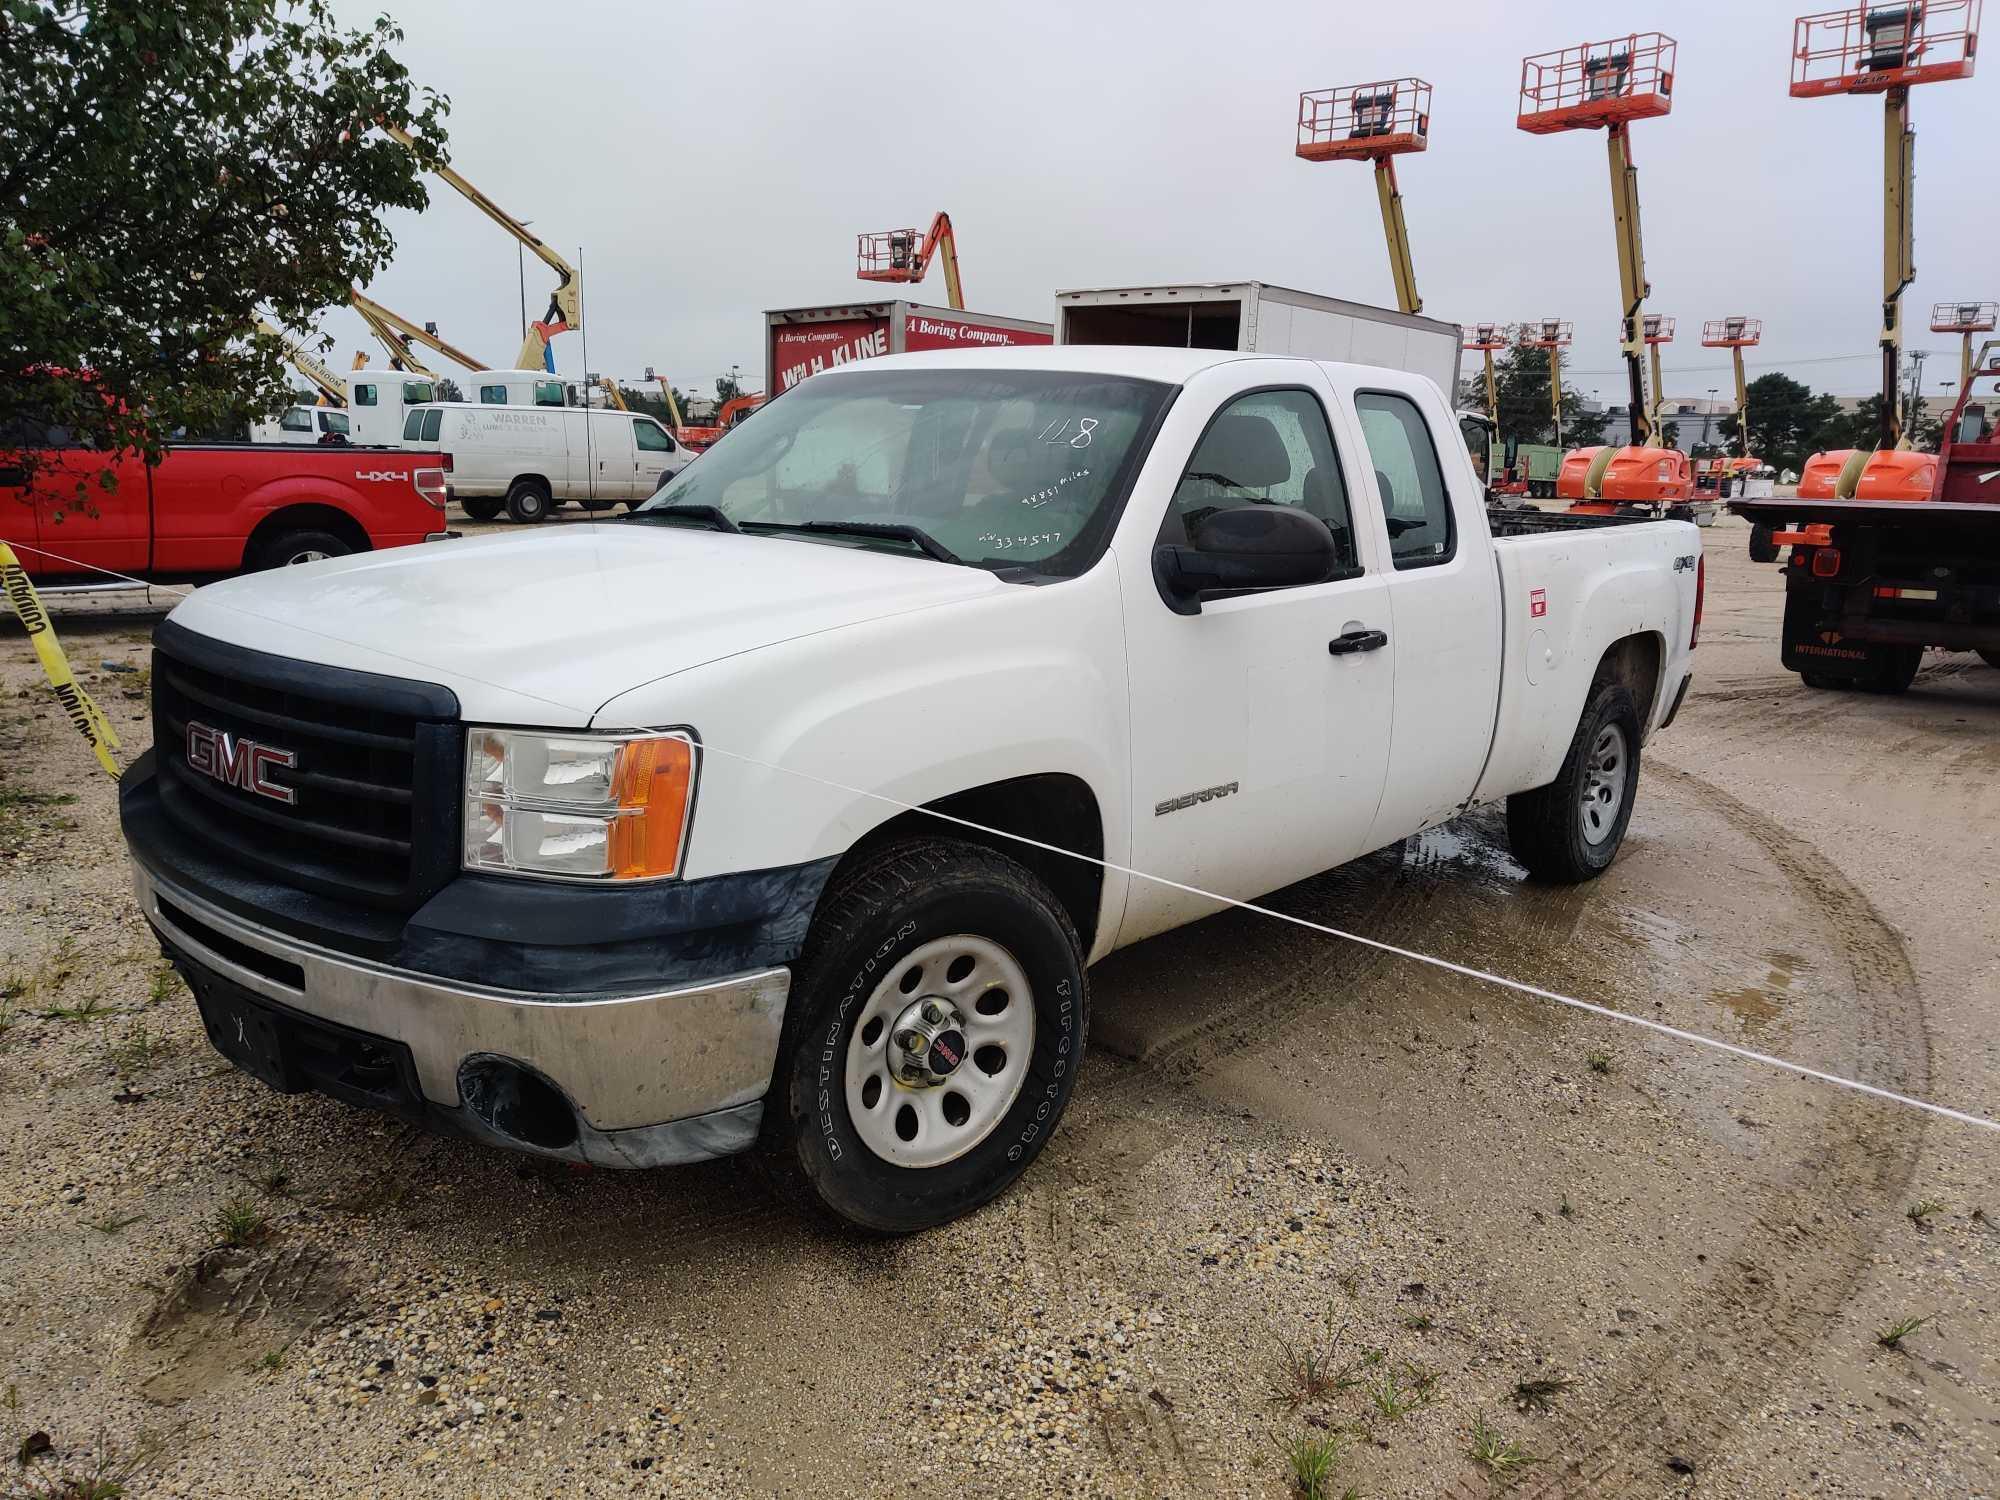 2011 GMC 1500 PICKUP TRUCK VN:1GTR2TEA0BZ334547 4x4